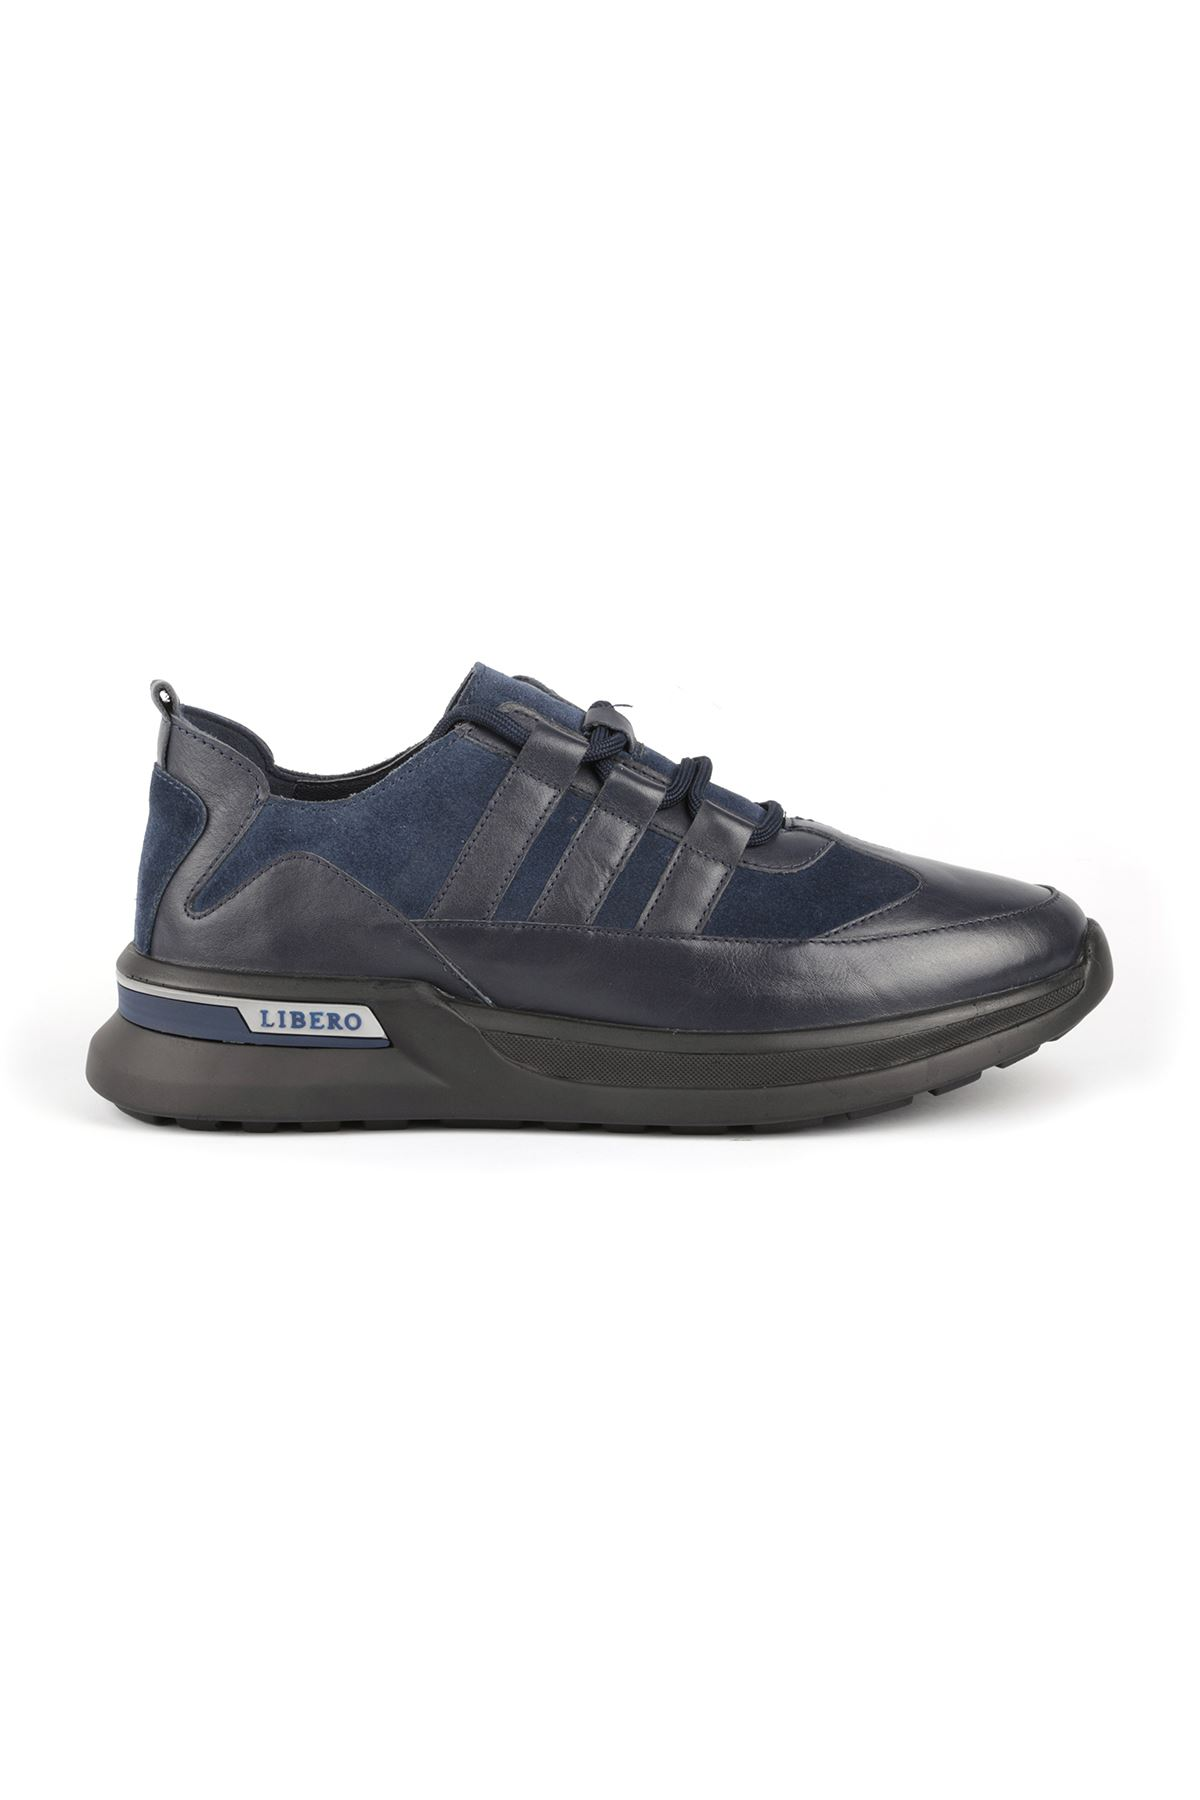 Libero L3598 Lacivert Spor Ayakkabı